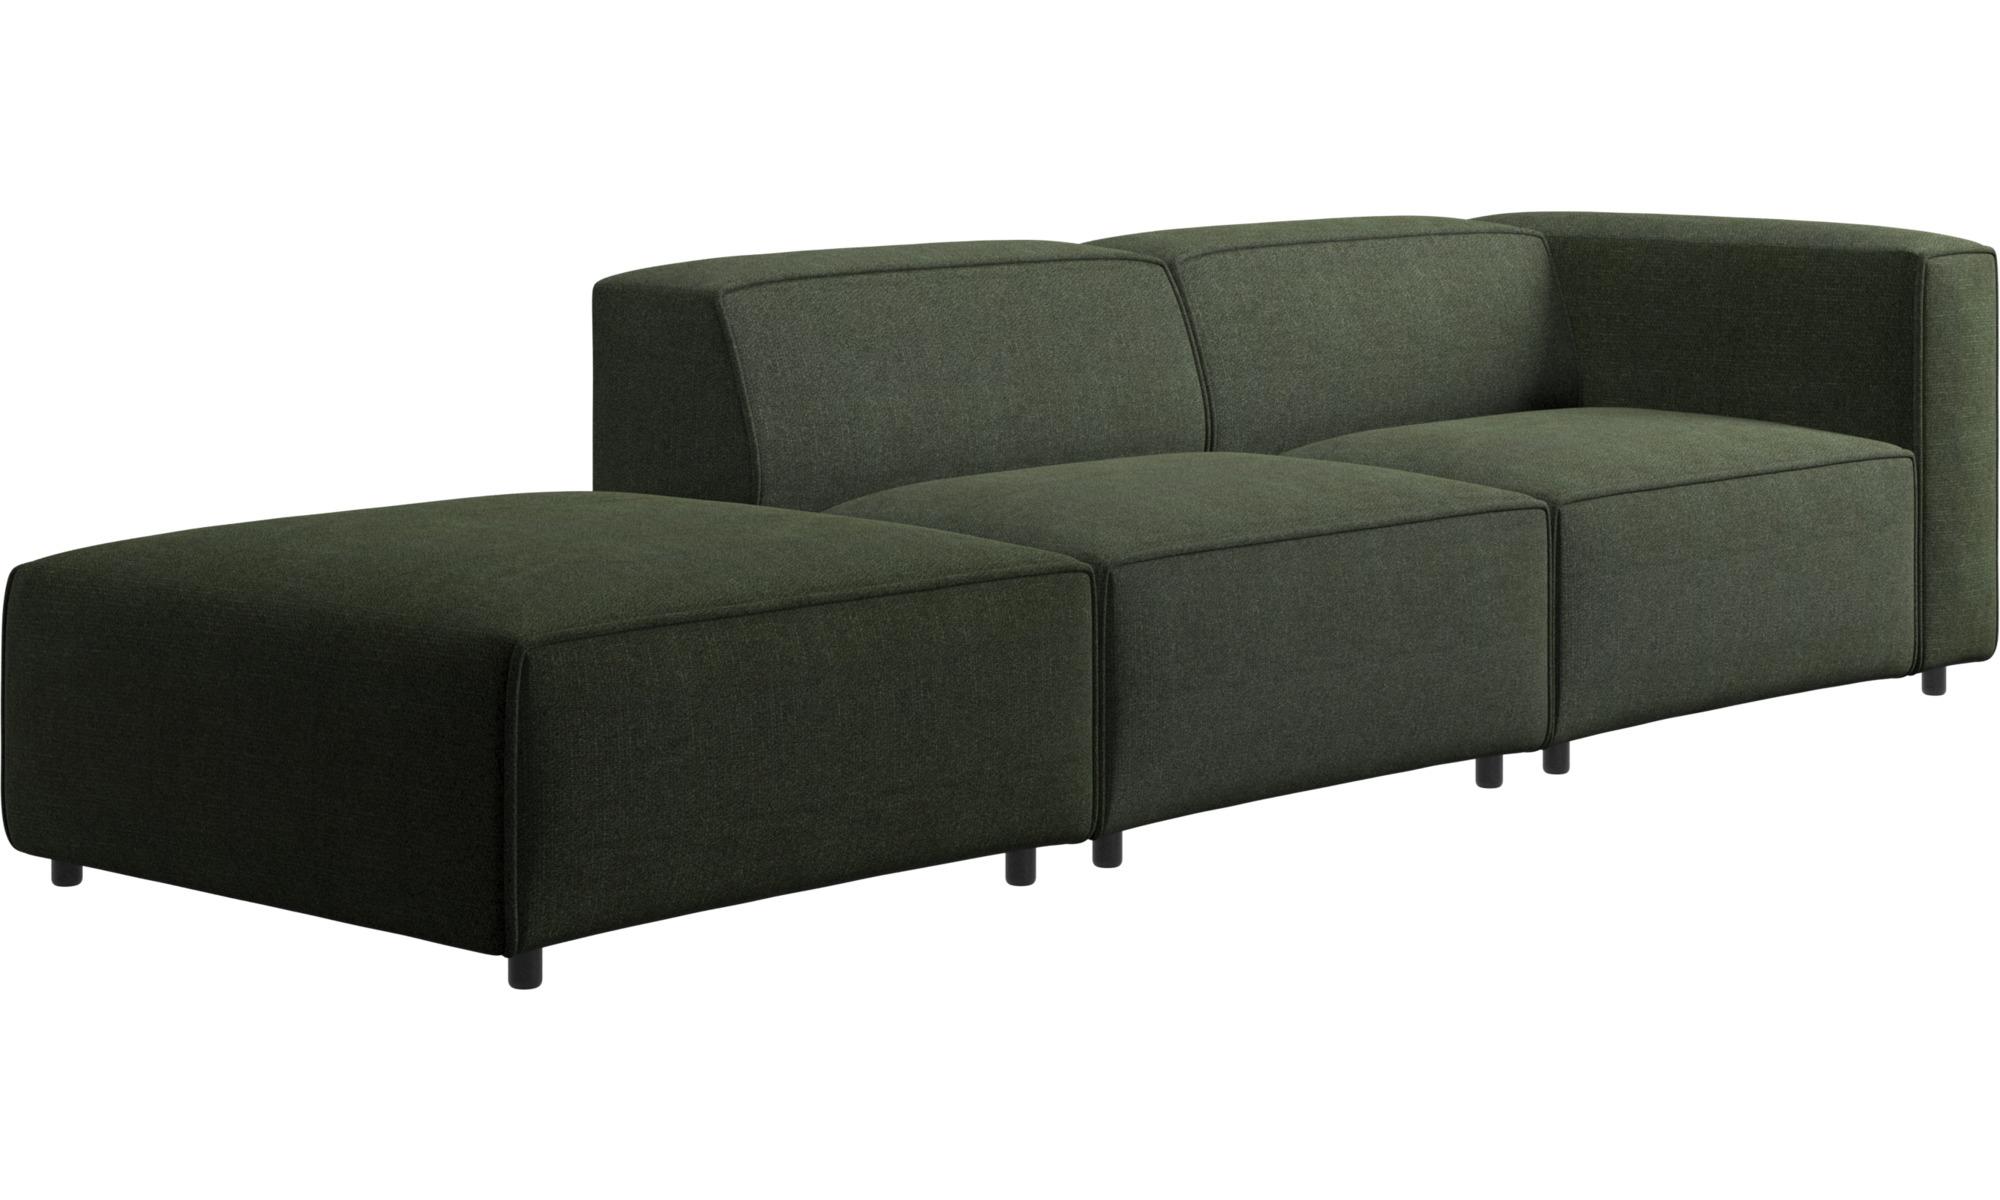 - Modular Sofas - Carmo Sofa With Lounging Unit - BoConcept